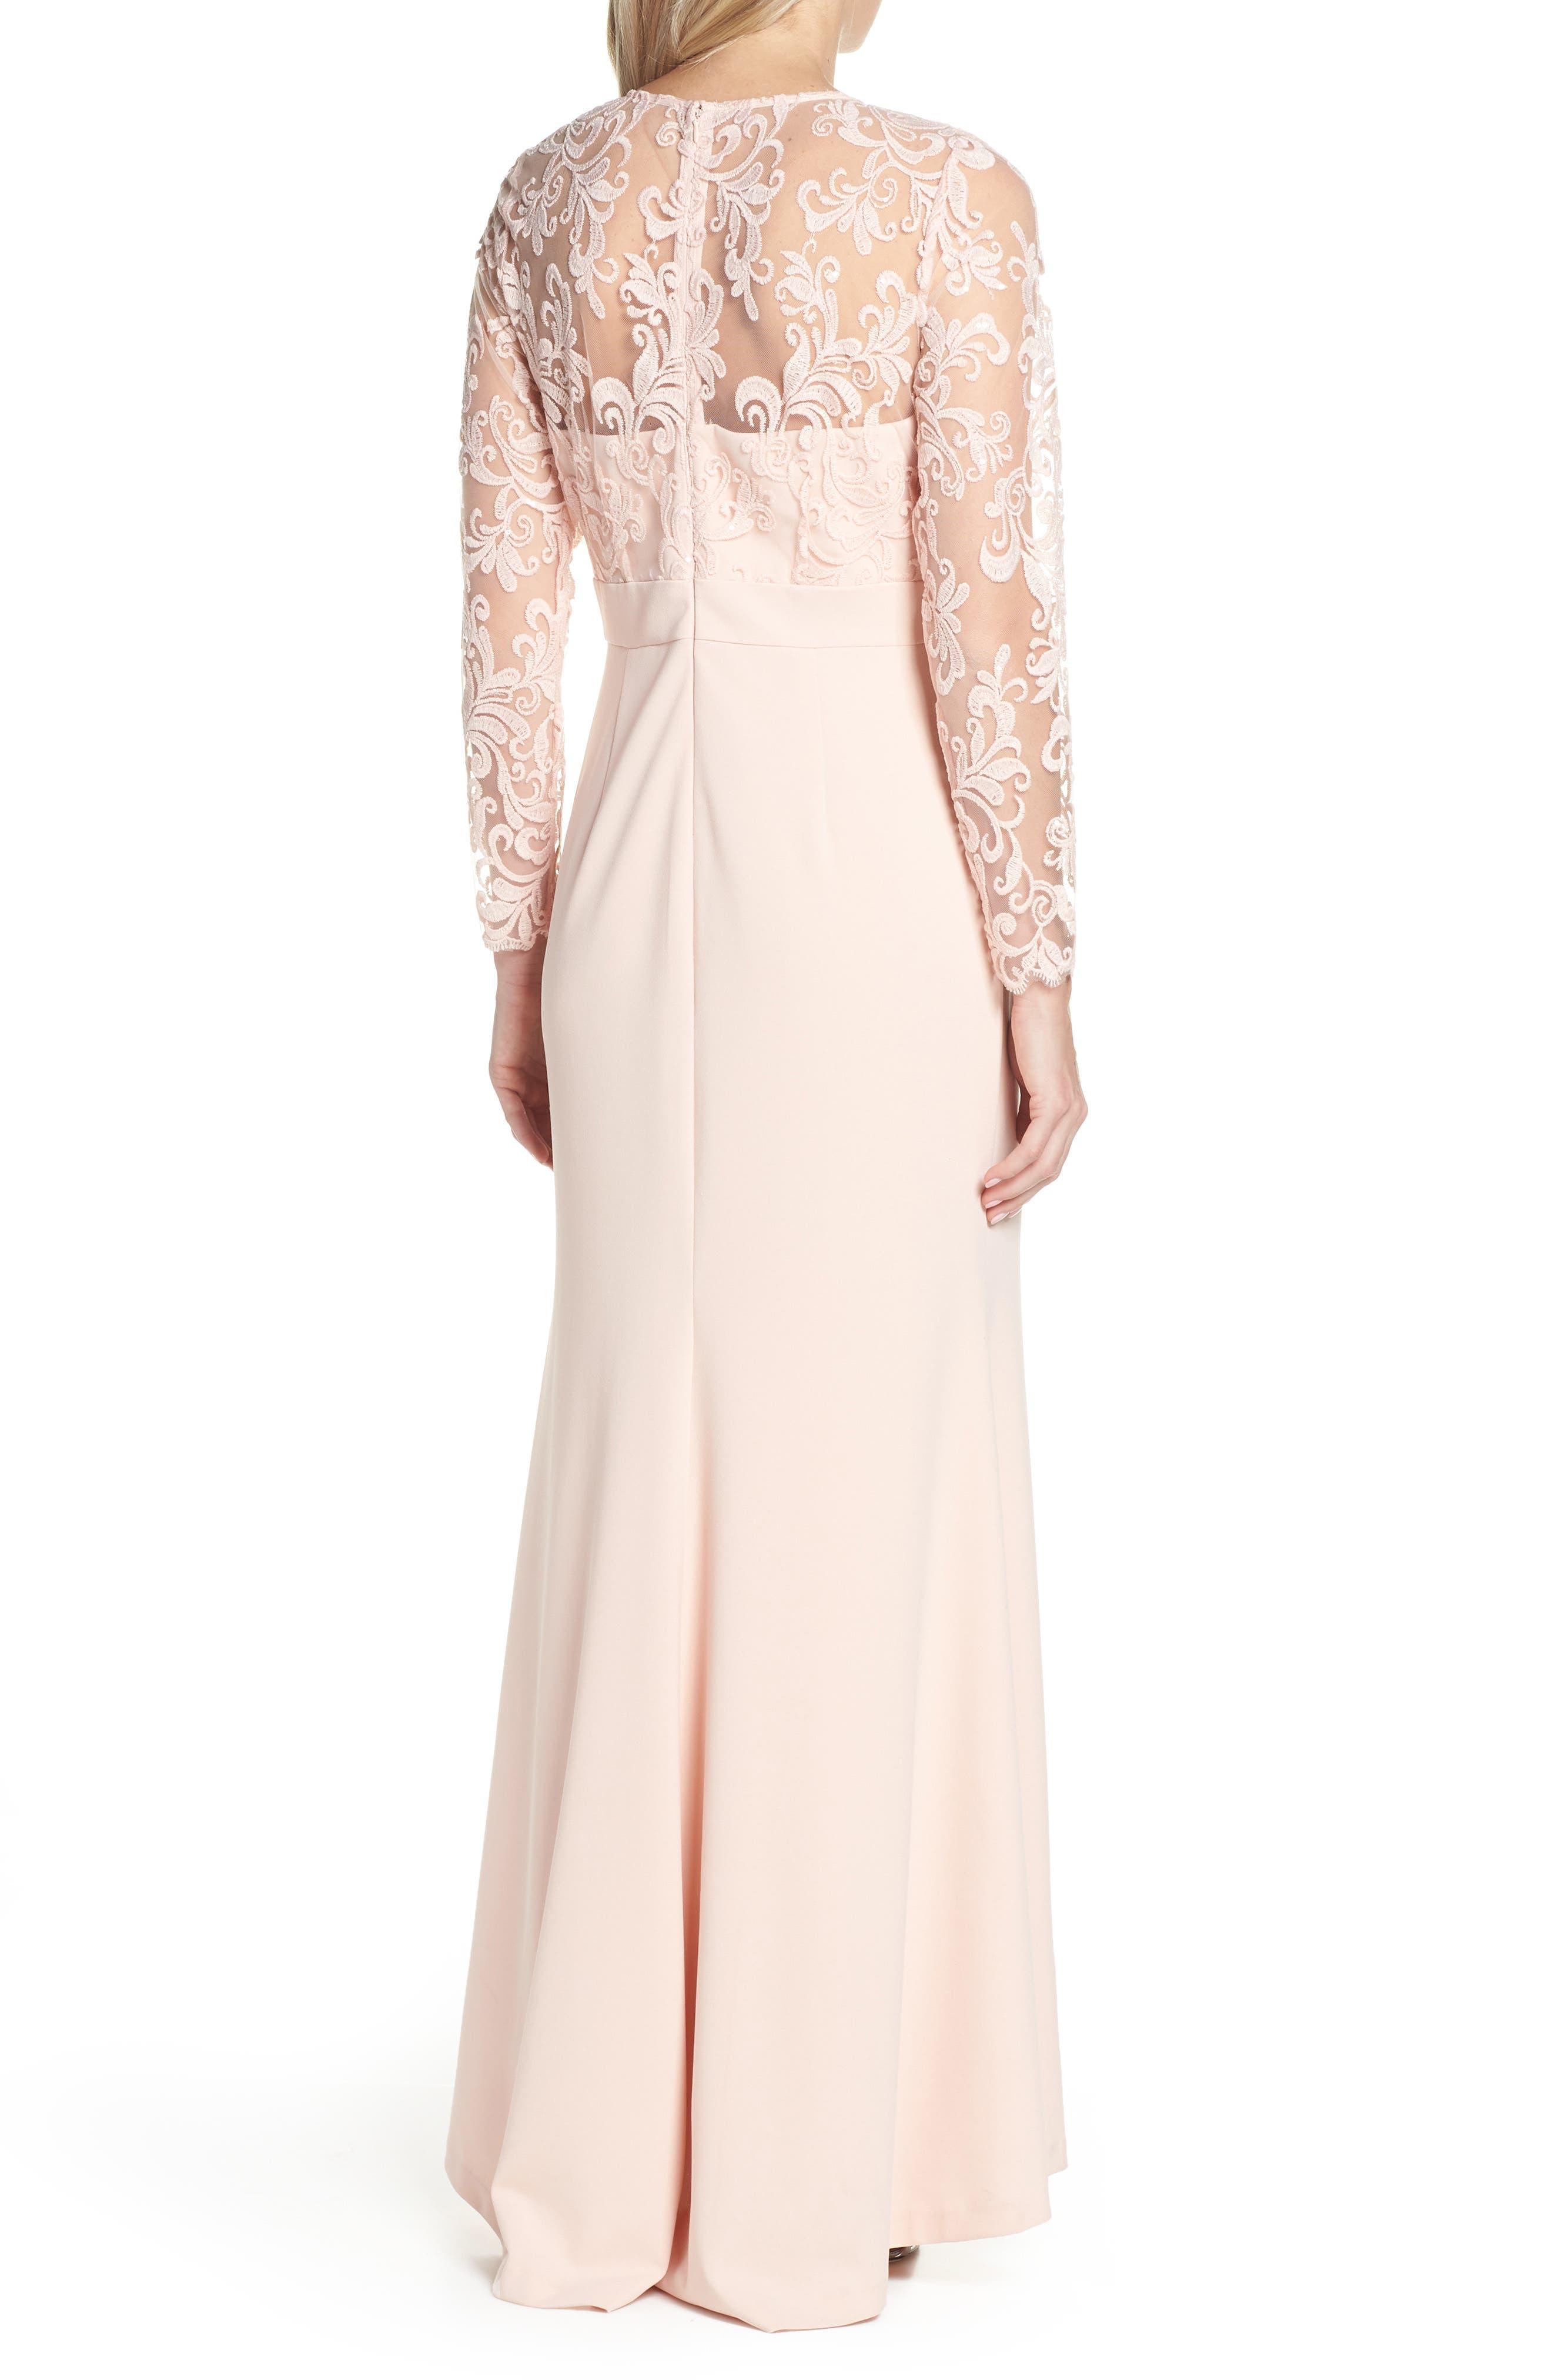 ELIZA J, Embroidered Bodice Crepe Evening Dress, Alternate thumbnail 4, color, BLUSH